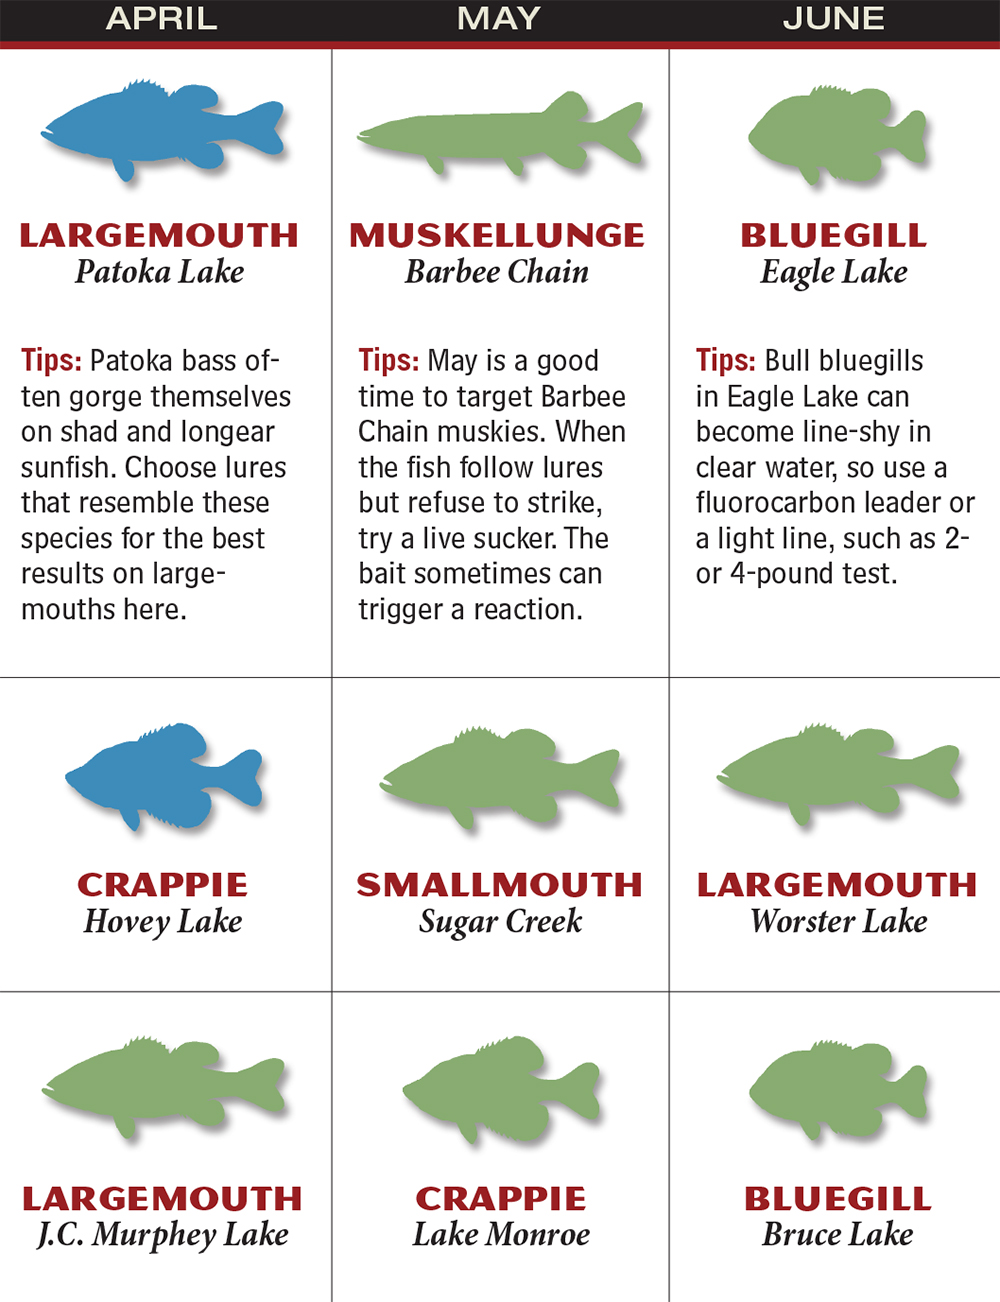 Indiana 2016 Fishing Calendar